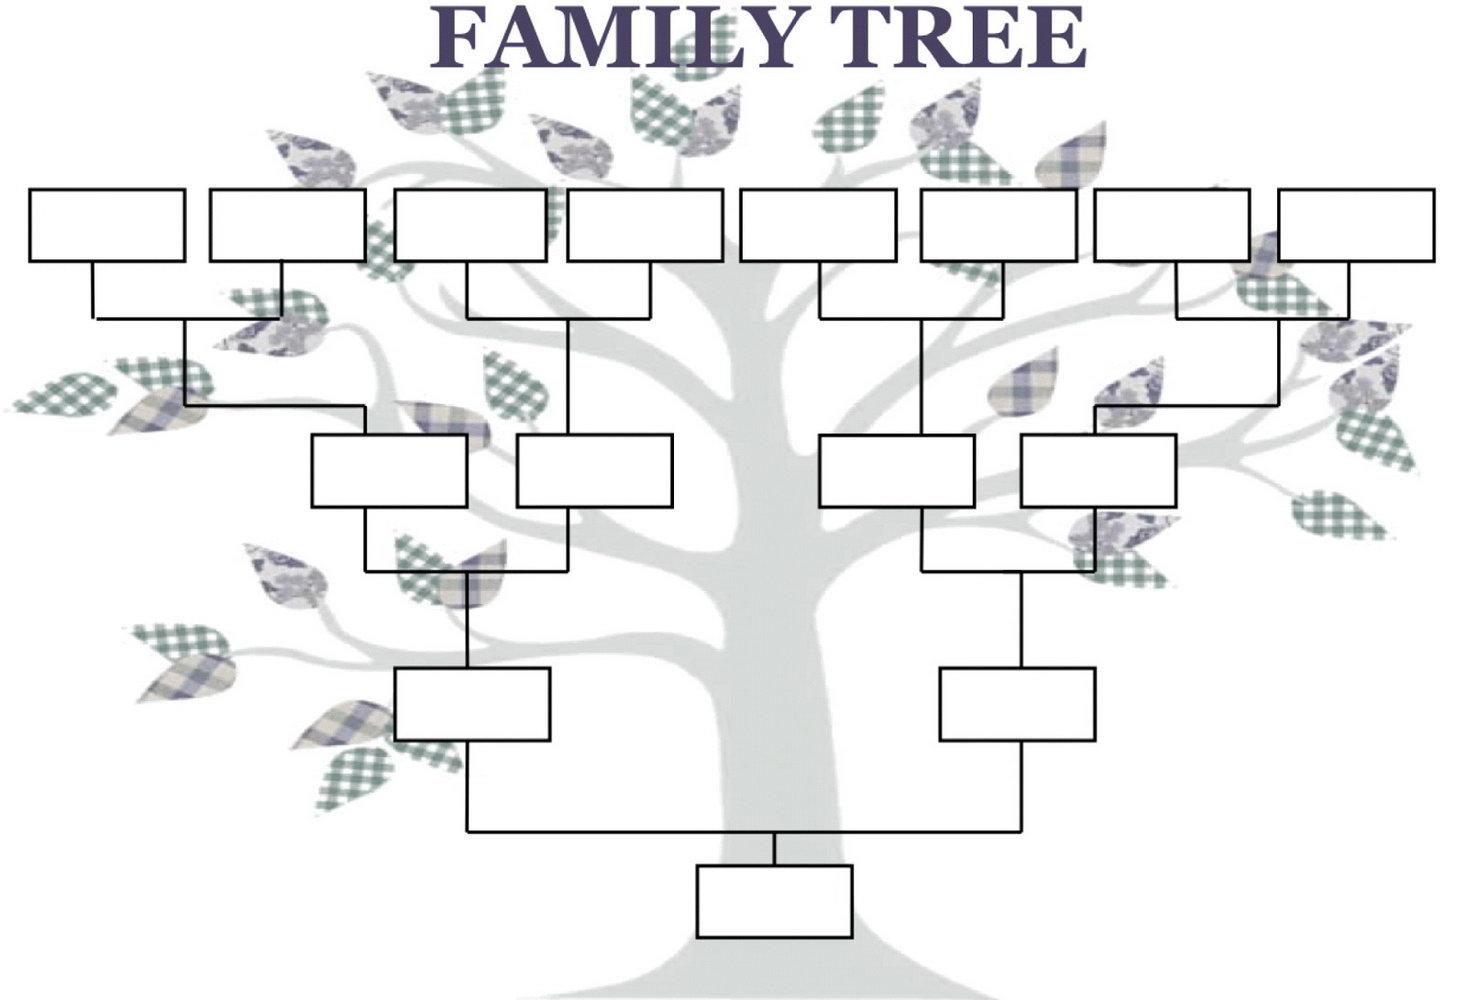 Genealogy Tree Templates